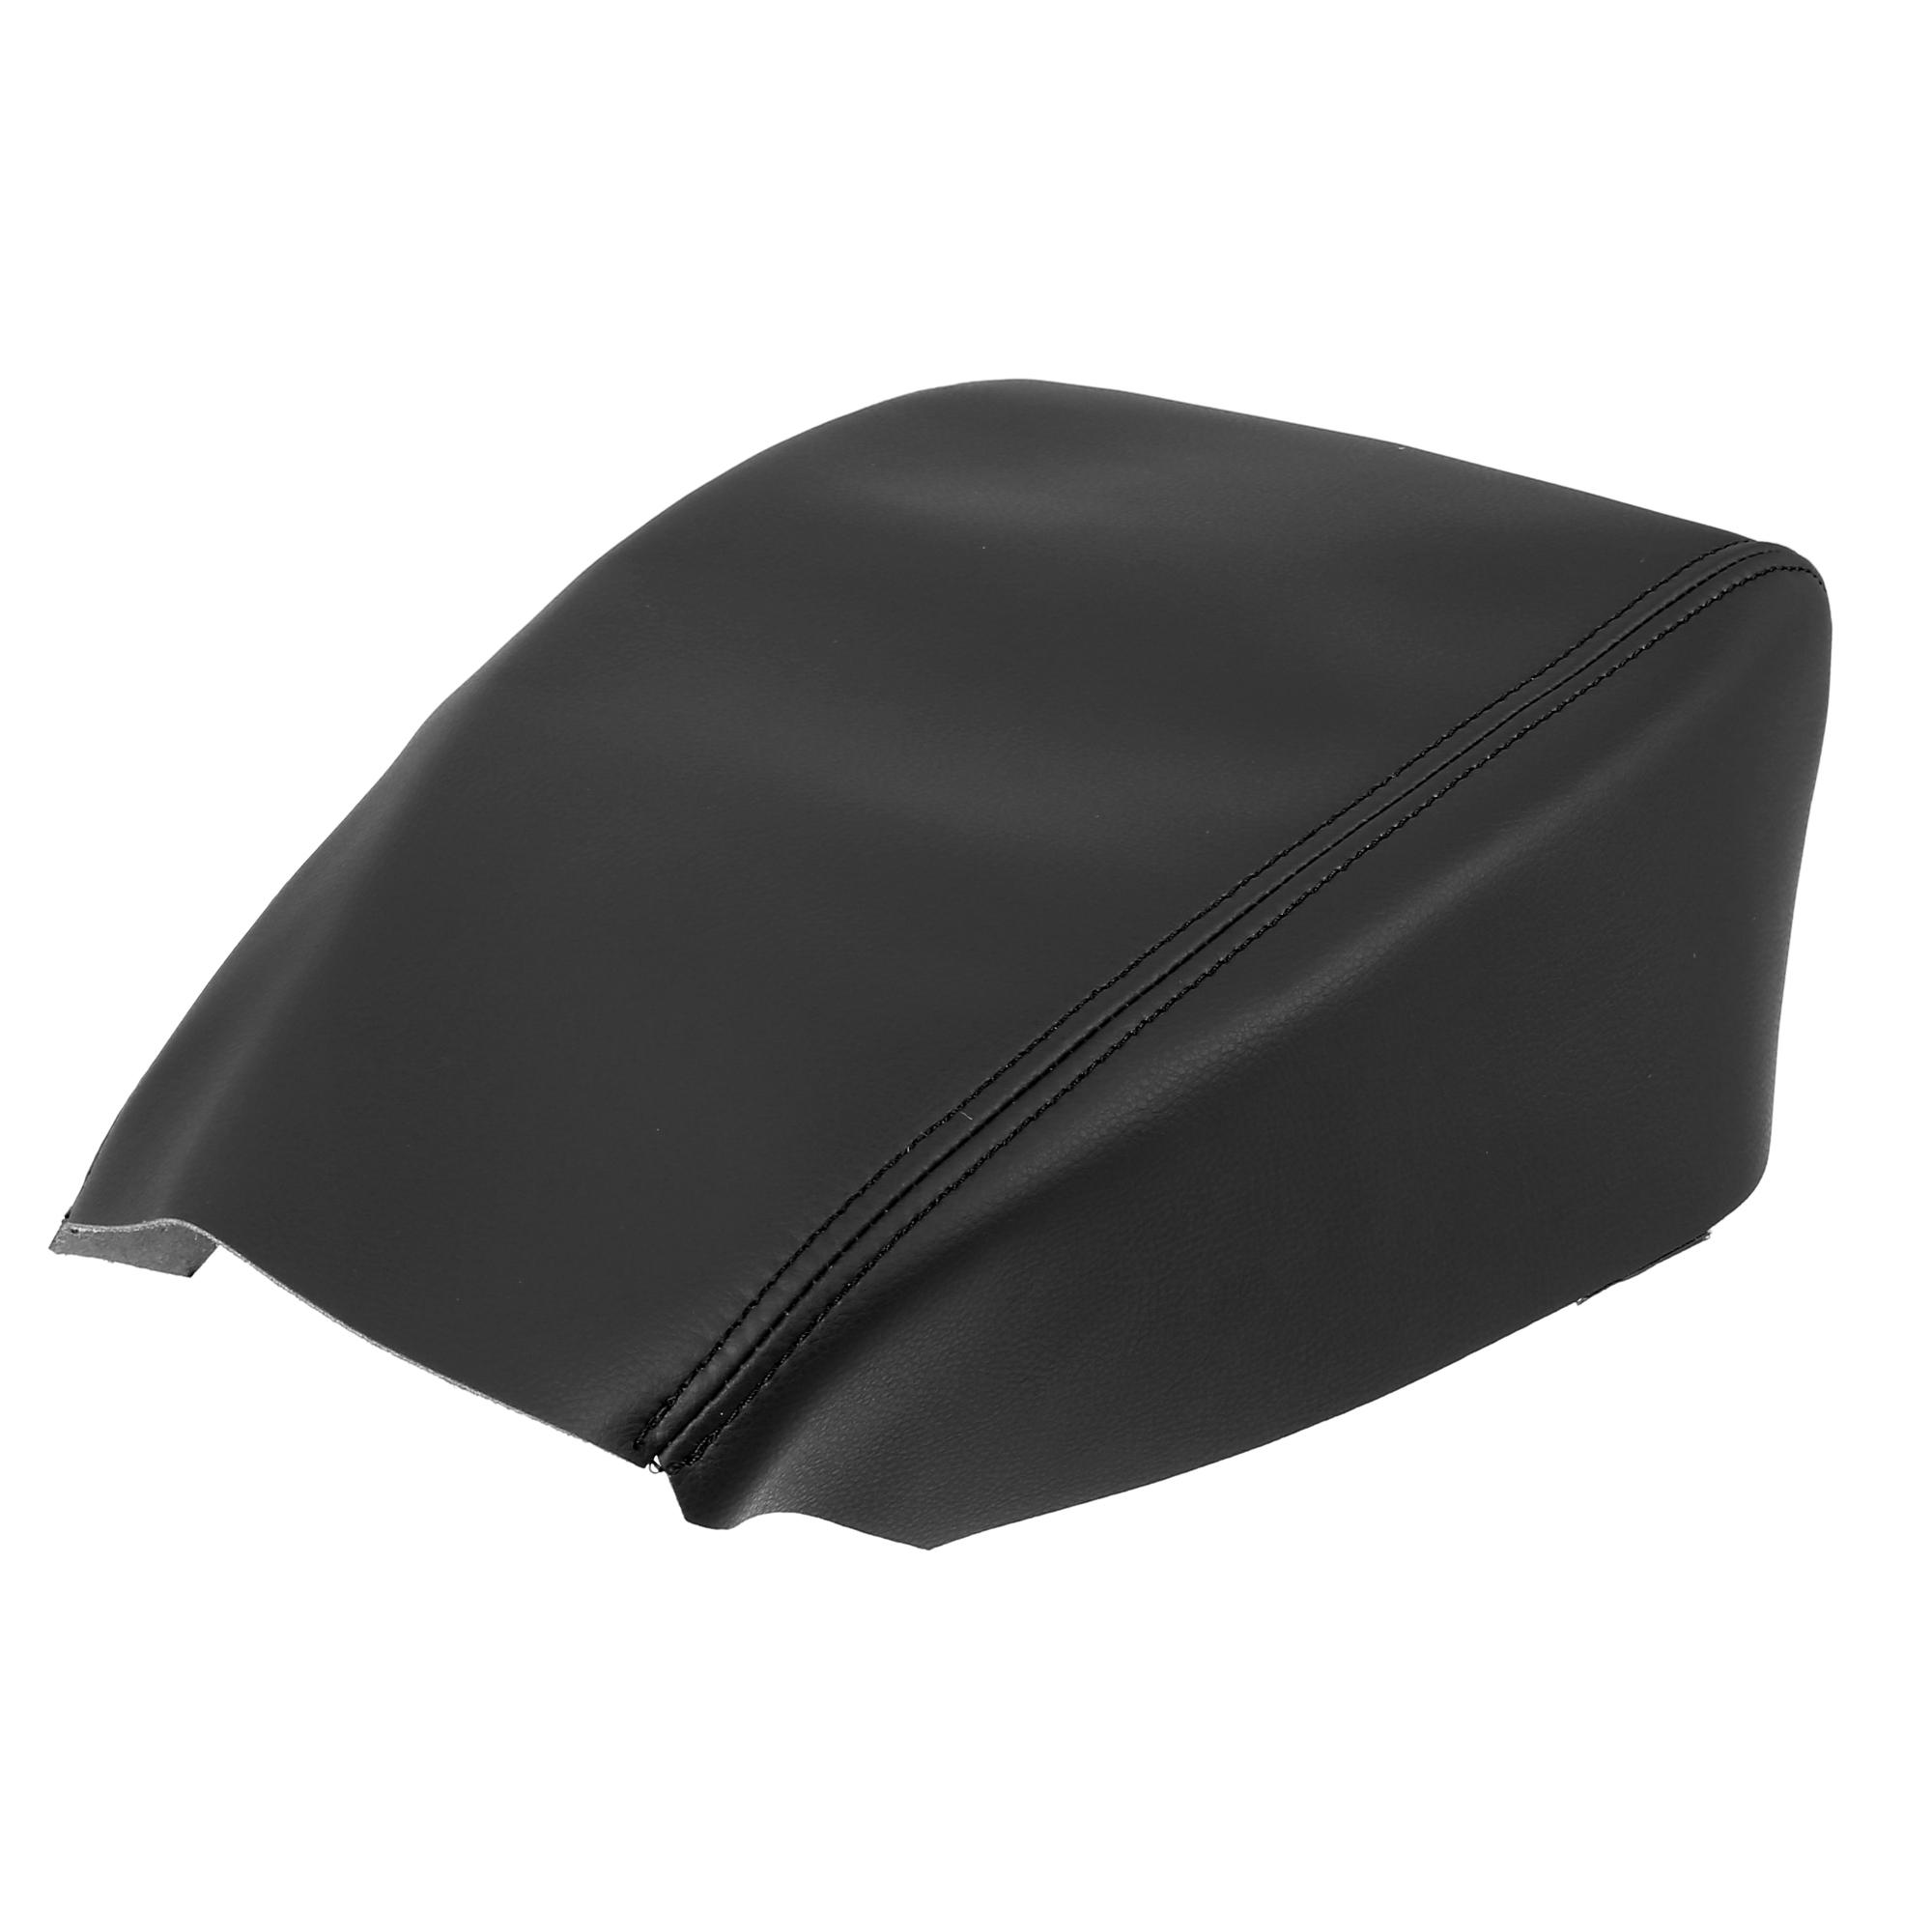 Car Center Console Lid Armrest Pad Cover Black Line for Mazda CX5 2018-2020